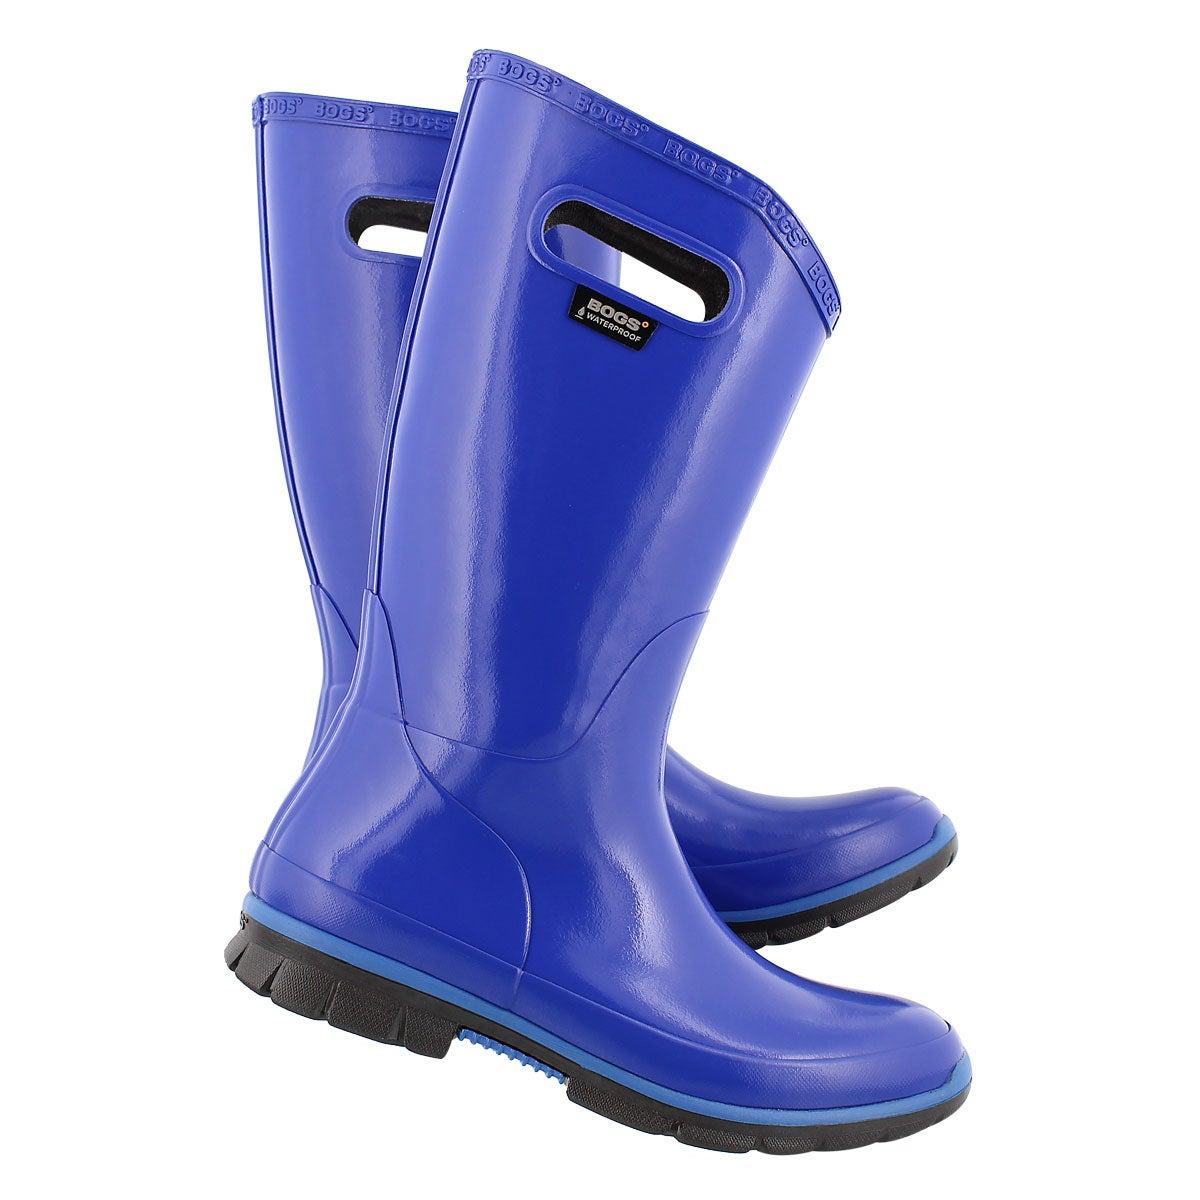 Lds Berkley french blue tall rain boot